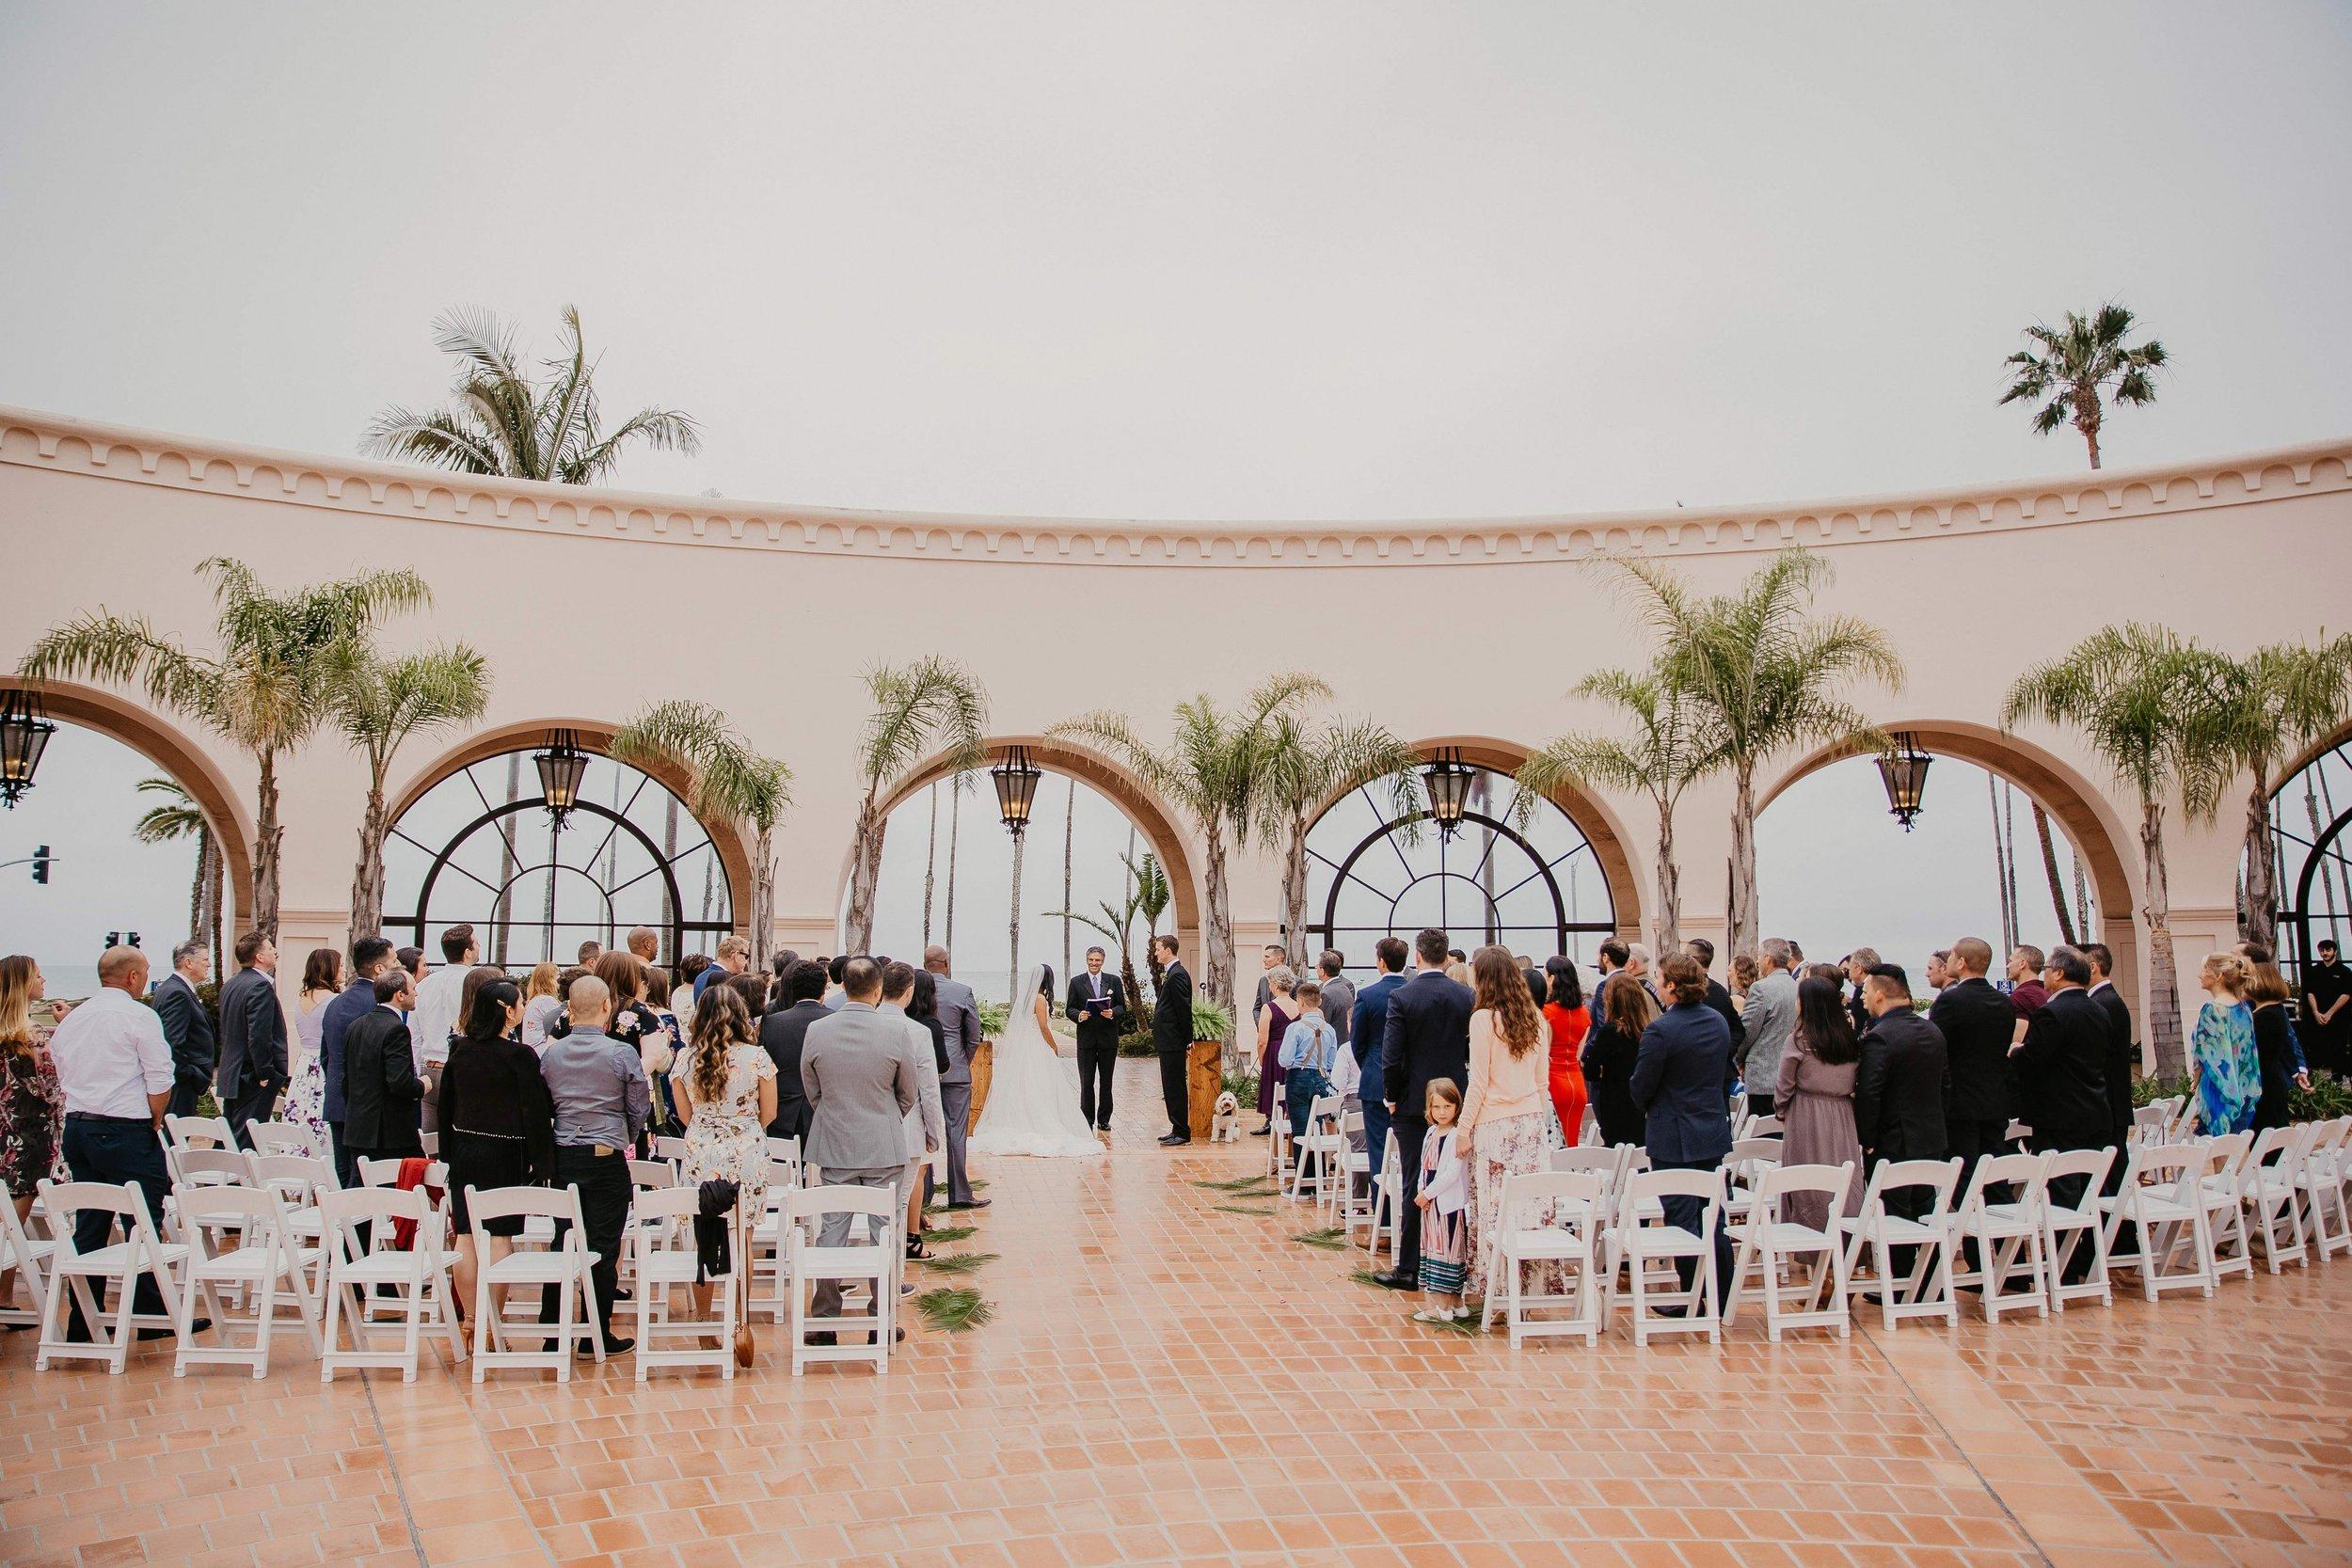 www.santabarbarawedding.com | Candice Marie Photography | Hilton Santa Barbara Beachfront Resort | Dalina Klan | Once in a Lifetime Weddings | Anthony Francisco | John Palminteri | The Ceremony